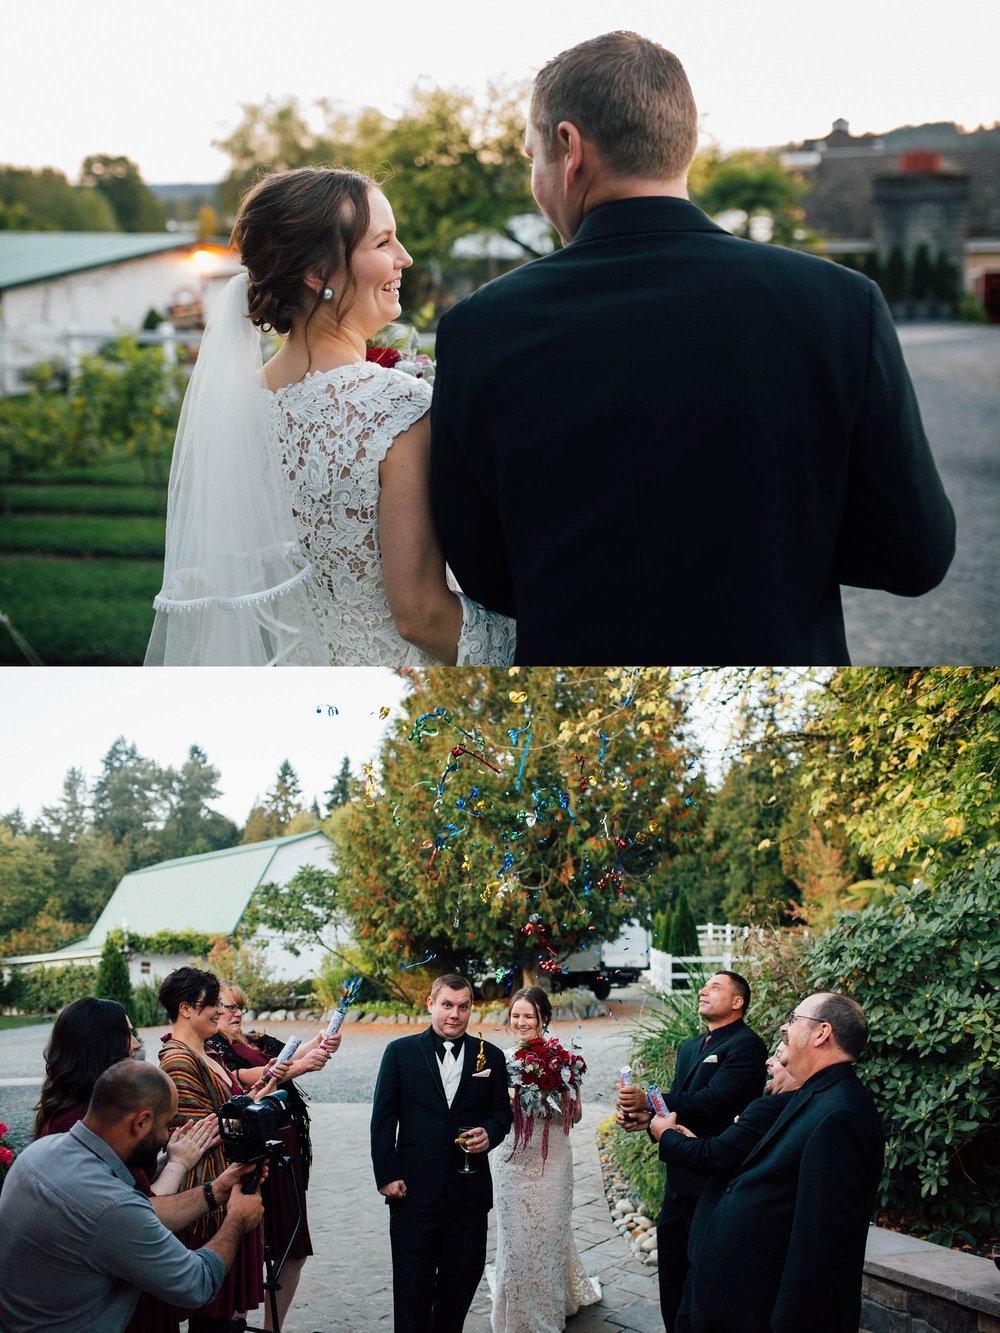 ashley_vos_seattle_ wedding_photographer_0197.jpg